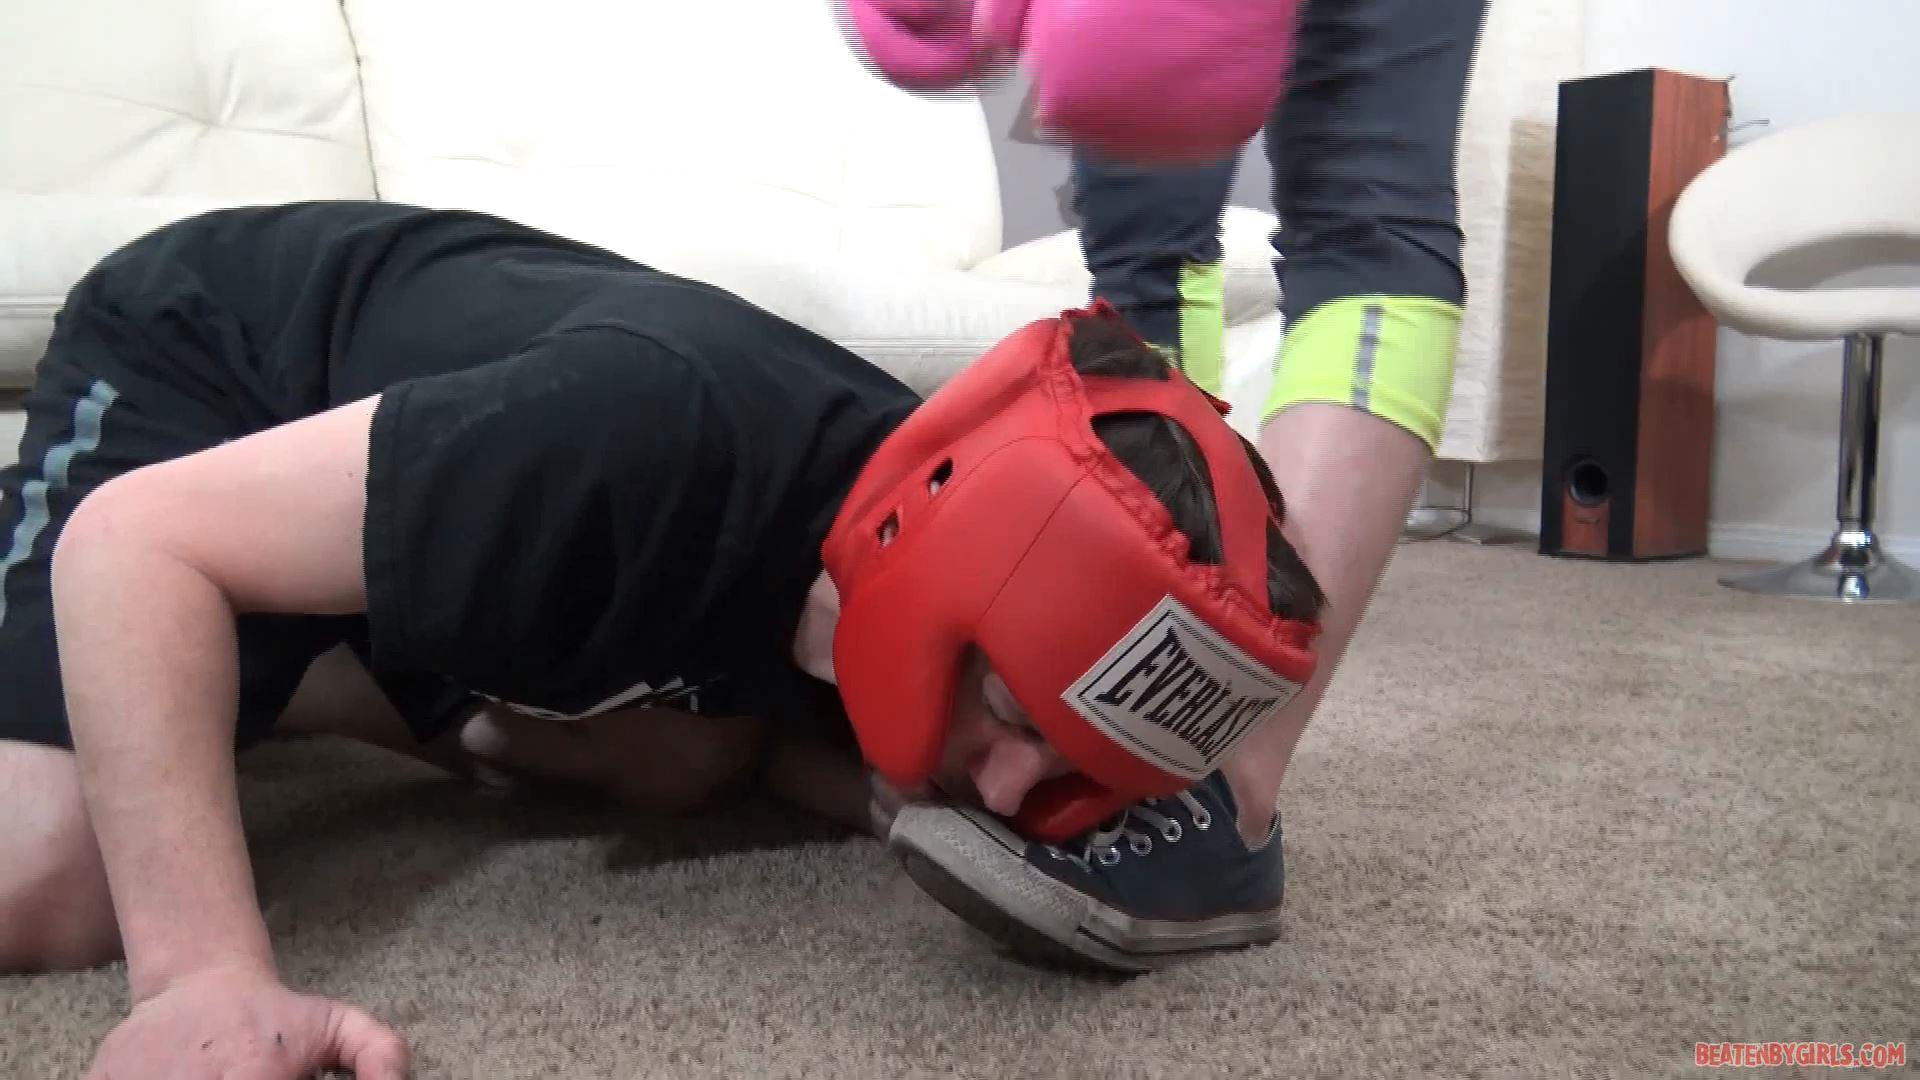 Pixie Star kicks, punches and slaps her victim - BEATENBYGIRLS - FULL HD/1080p/MP4